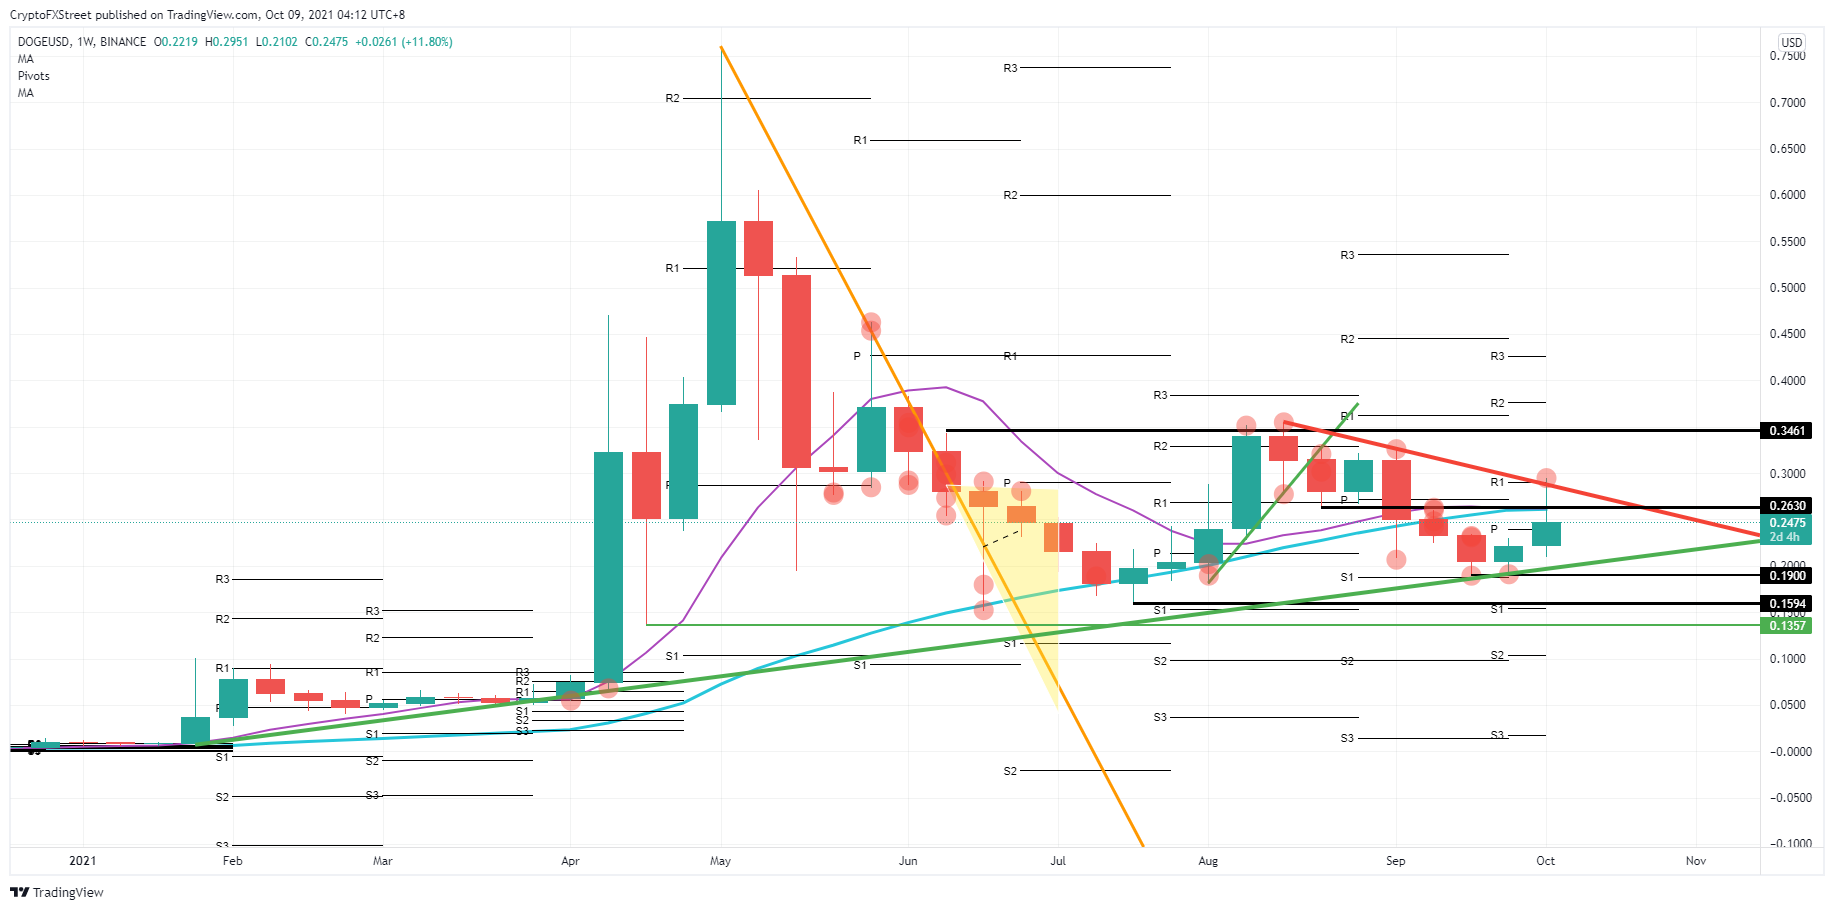 DOGE/USD weekly chart